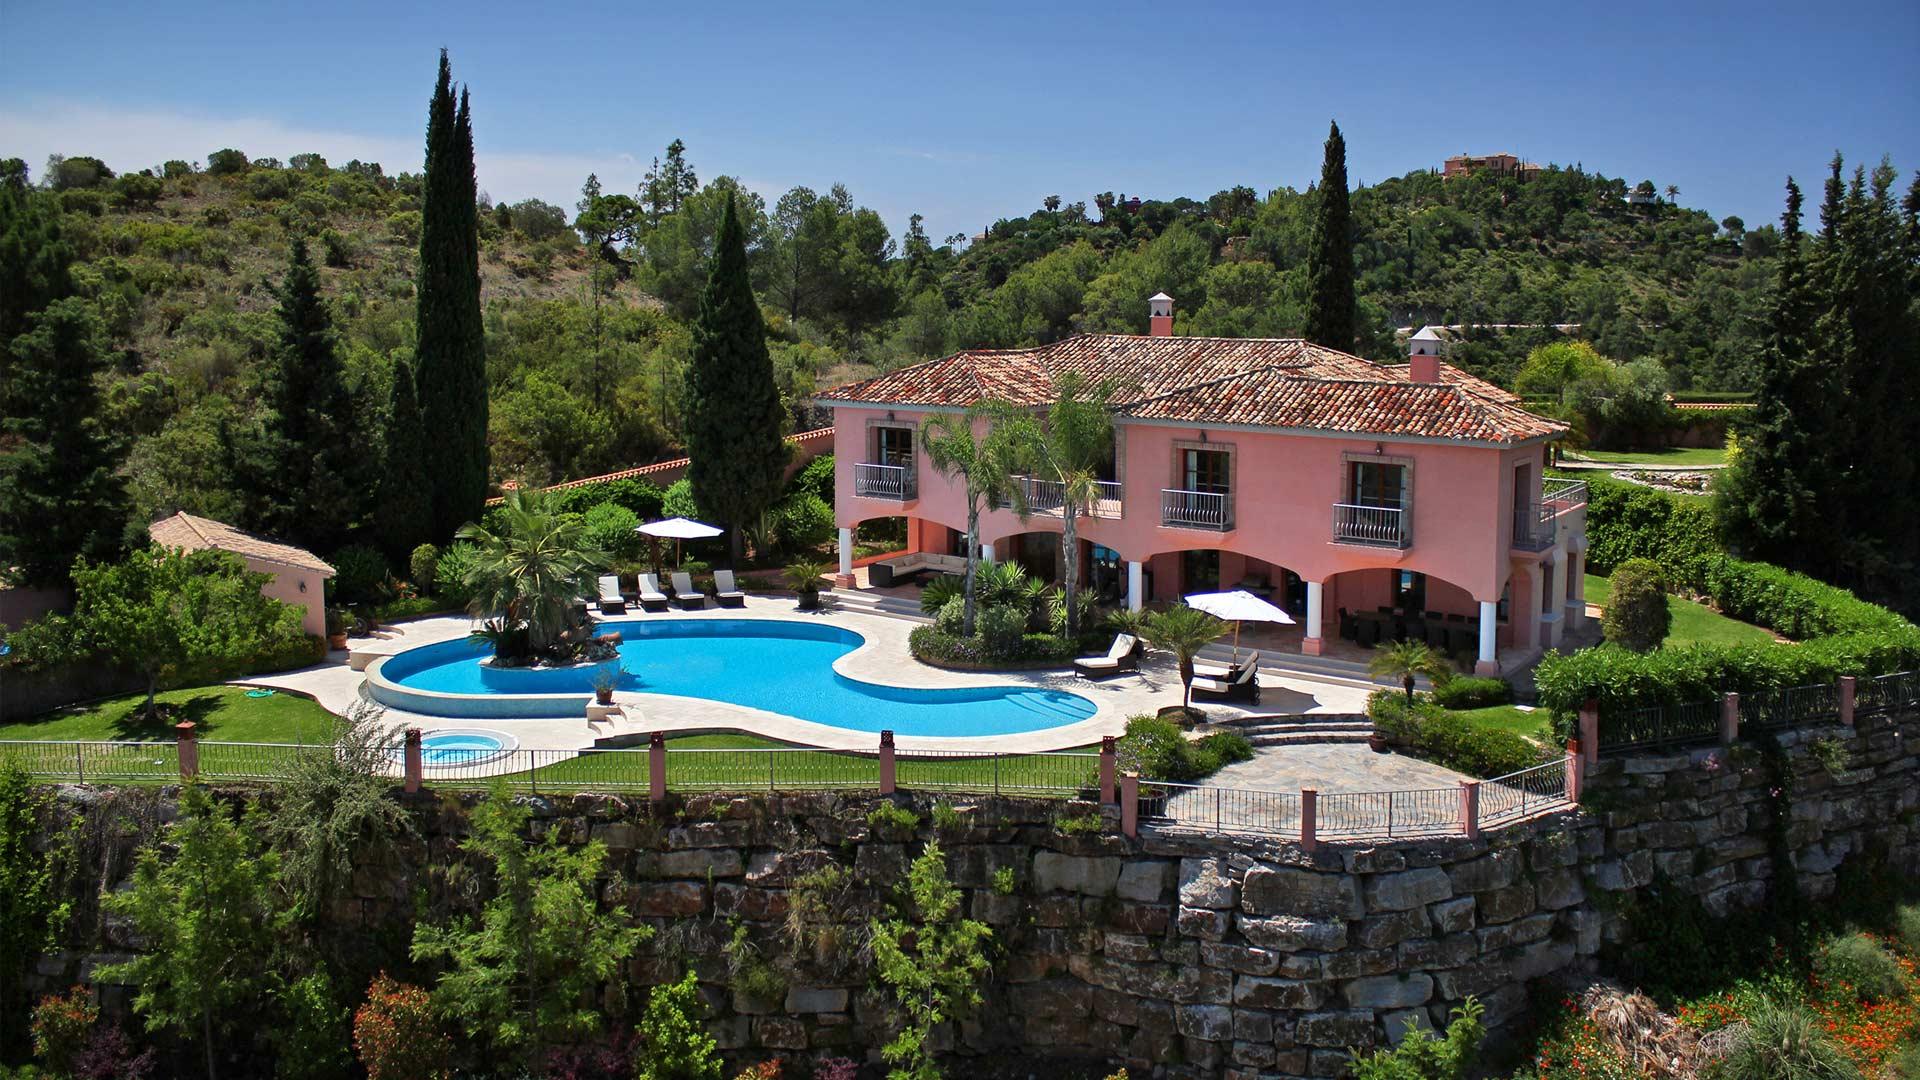 Villa Villa San Bernardo, Rental in Andalusia